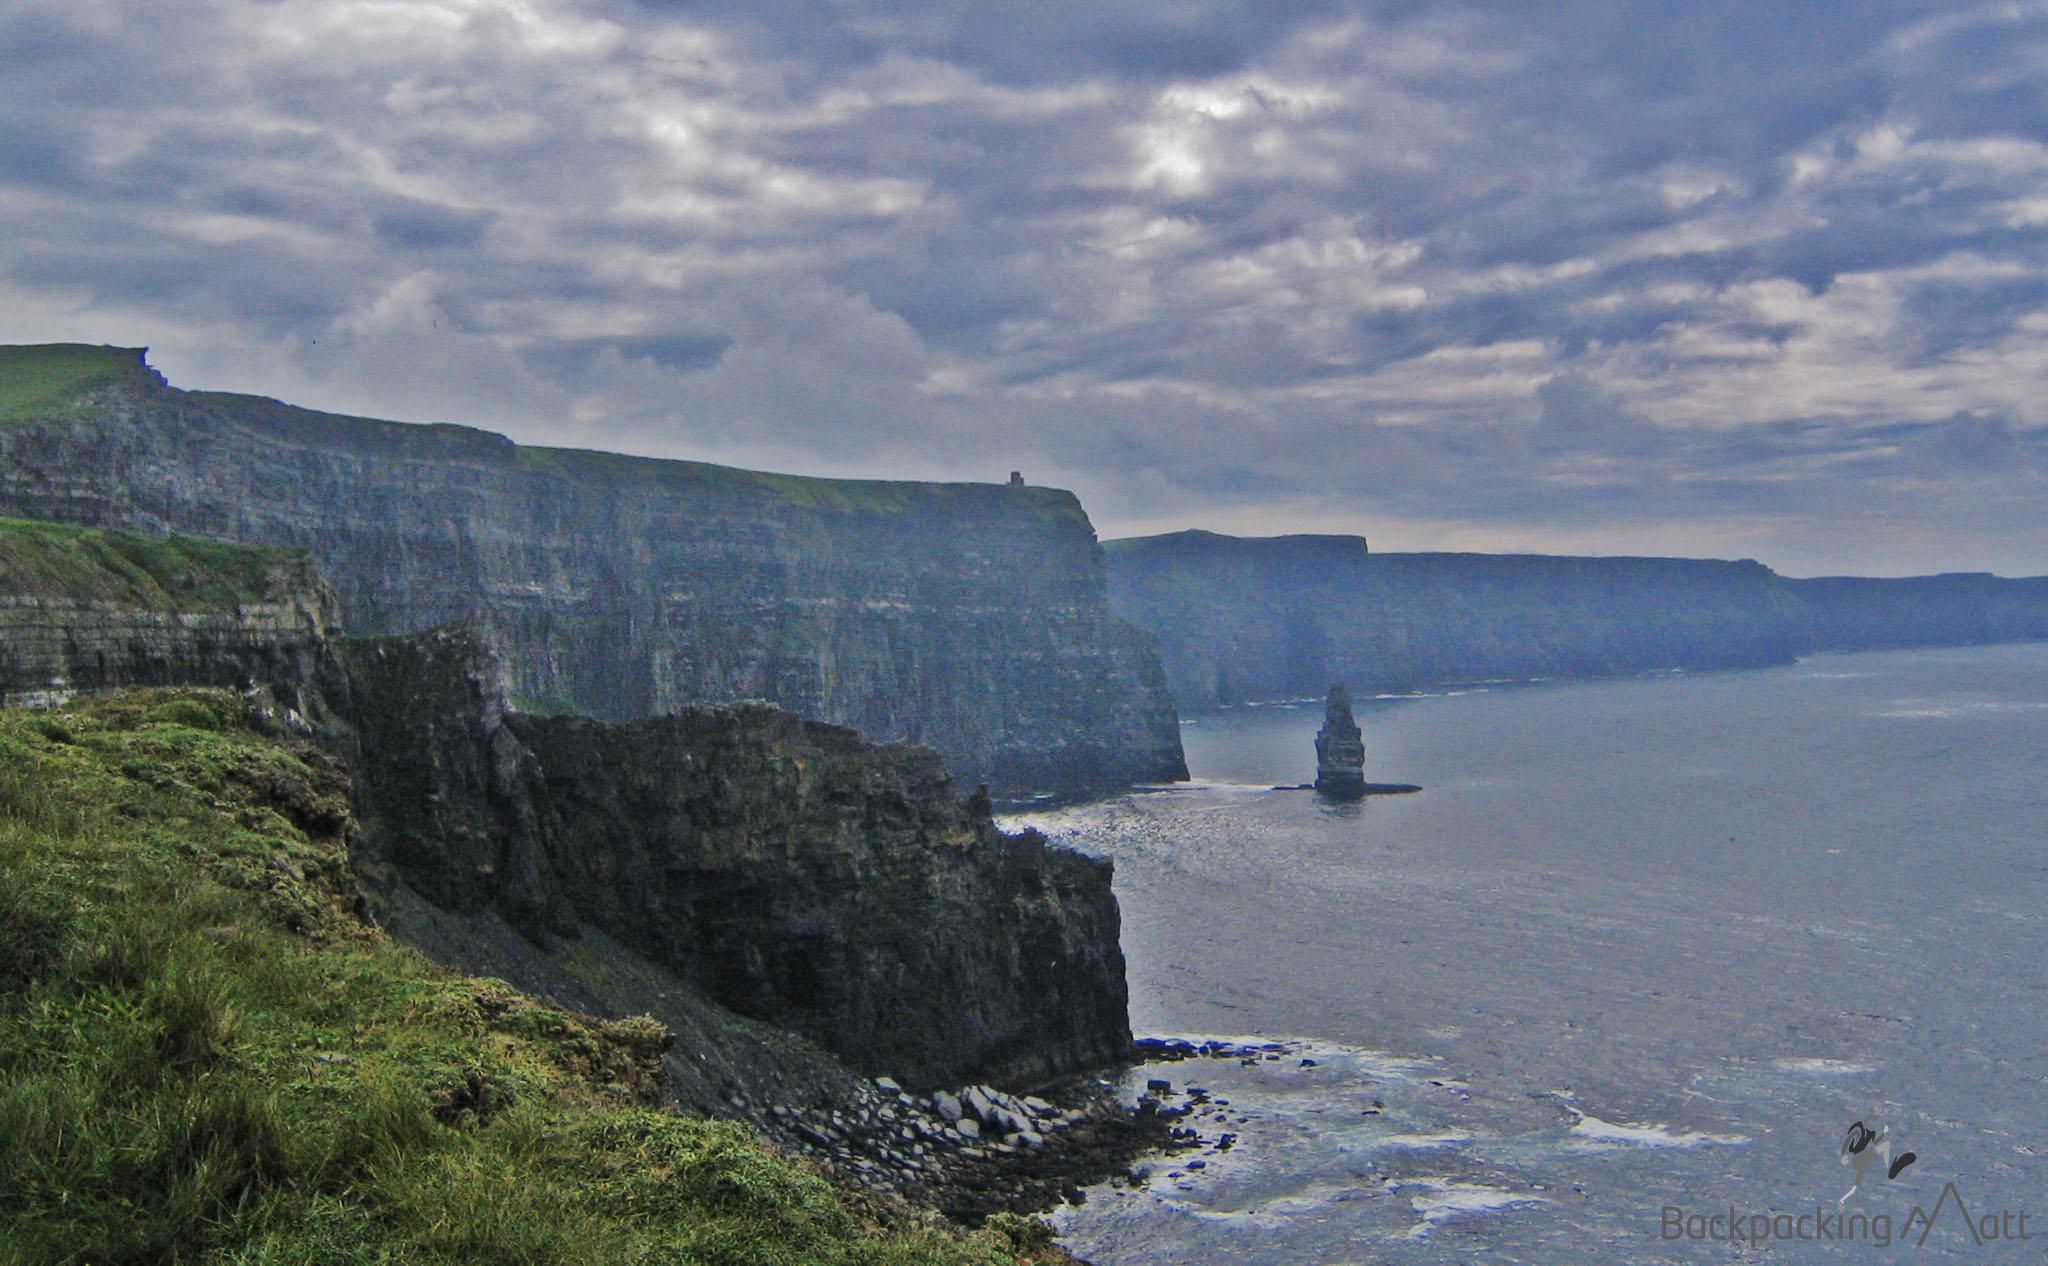 Ireland: Where it All Began